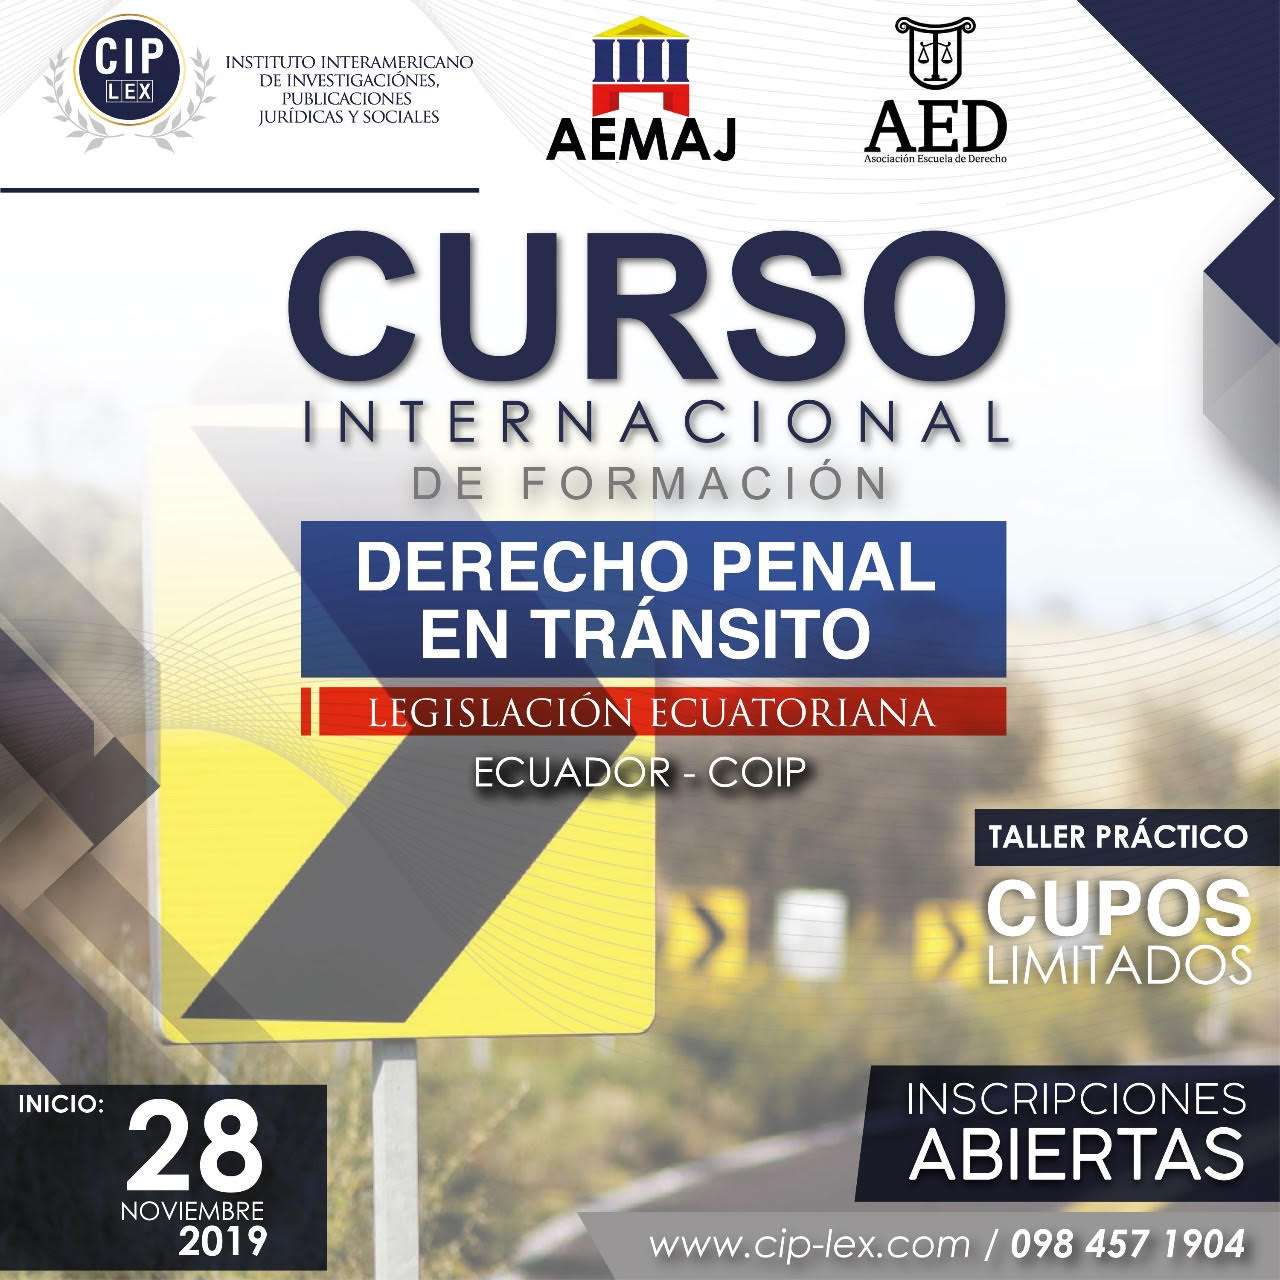 Curso Internacional de Formación de Derecho Penal en materia de Tránsito